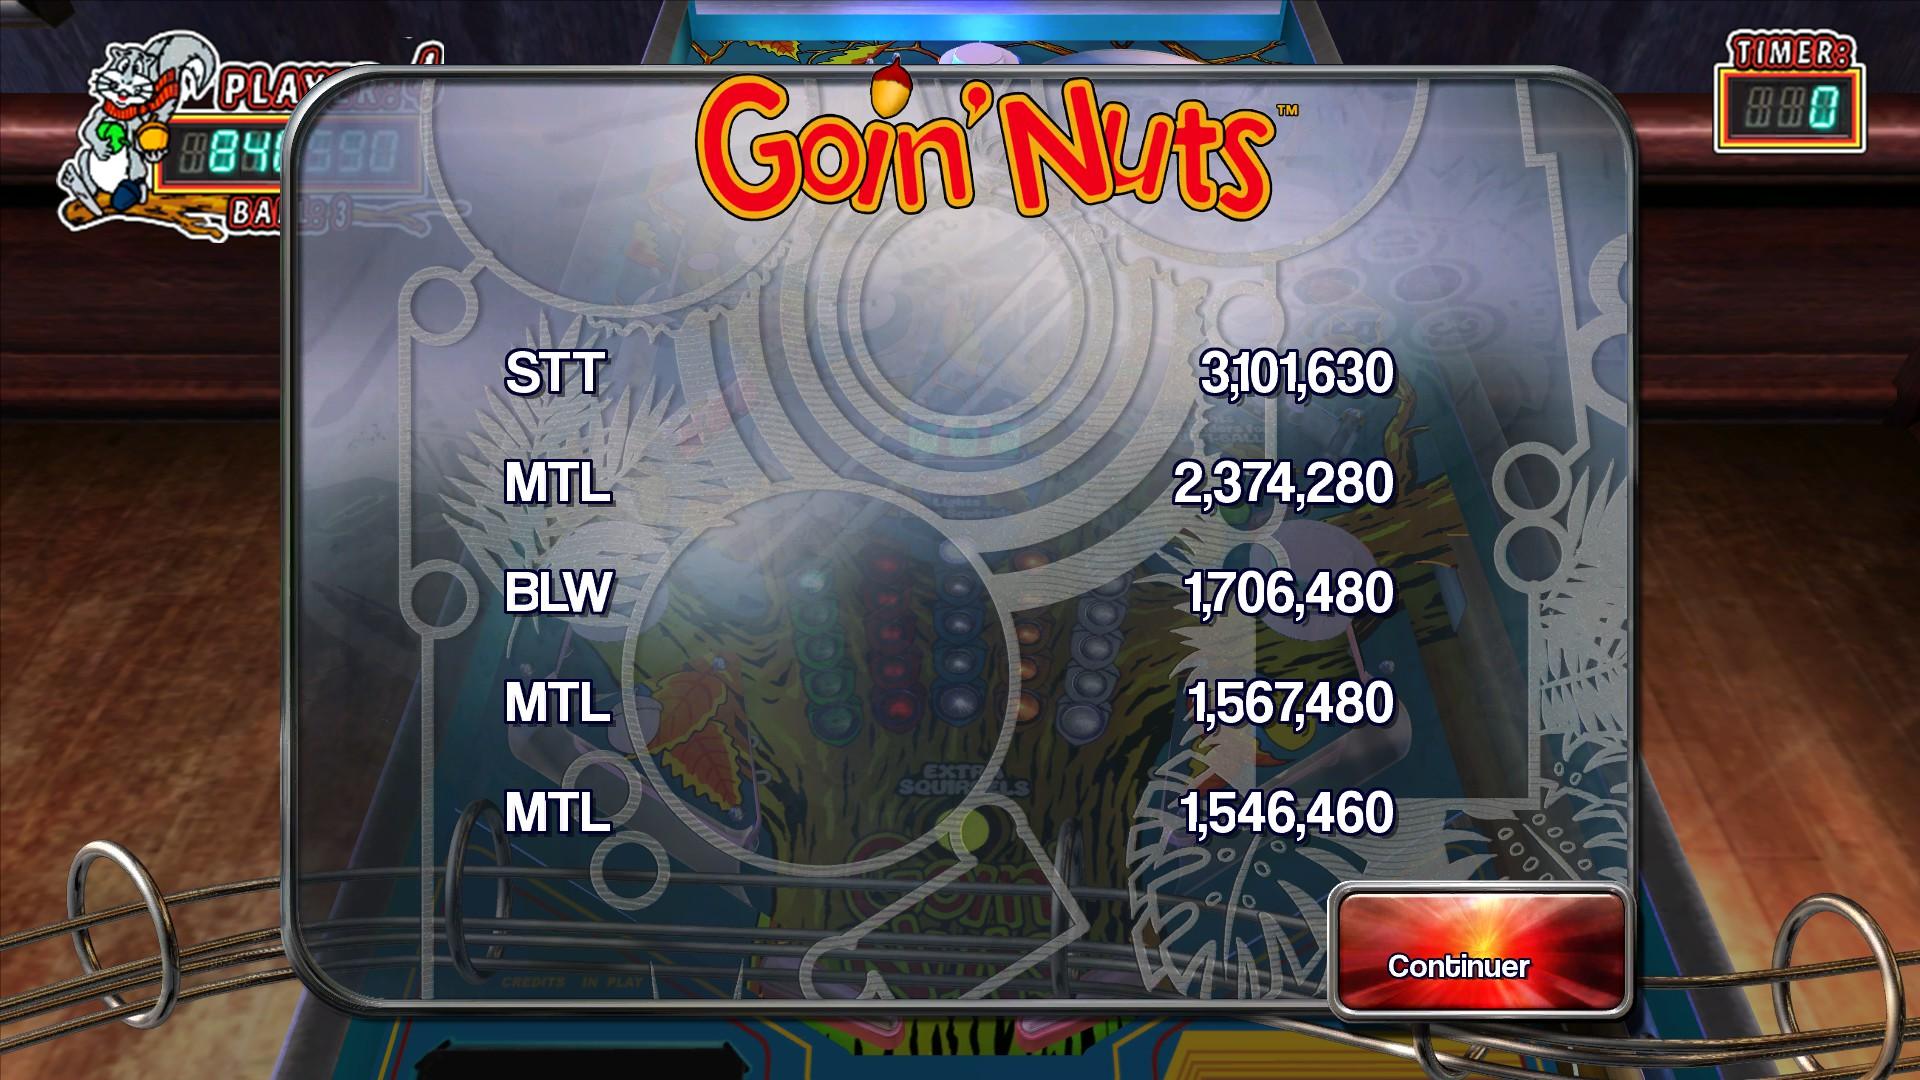 Mantalow: Pinball Arcade: Goin